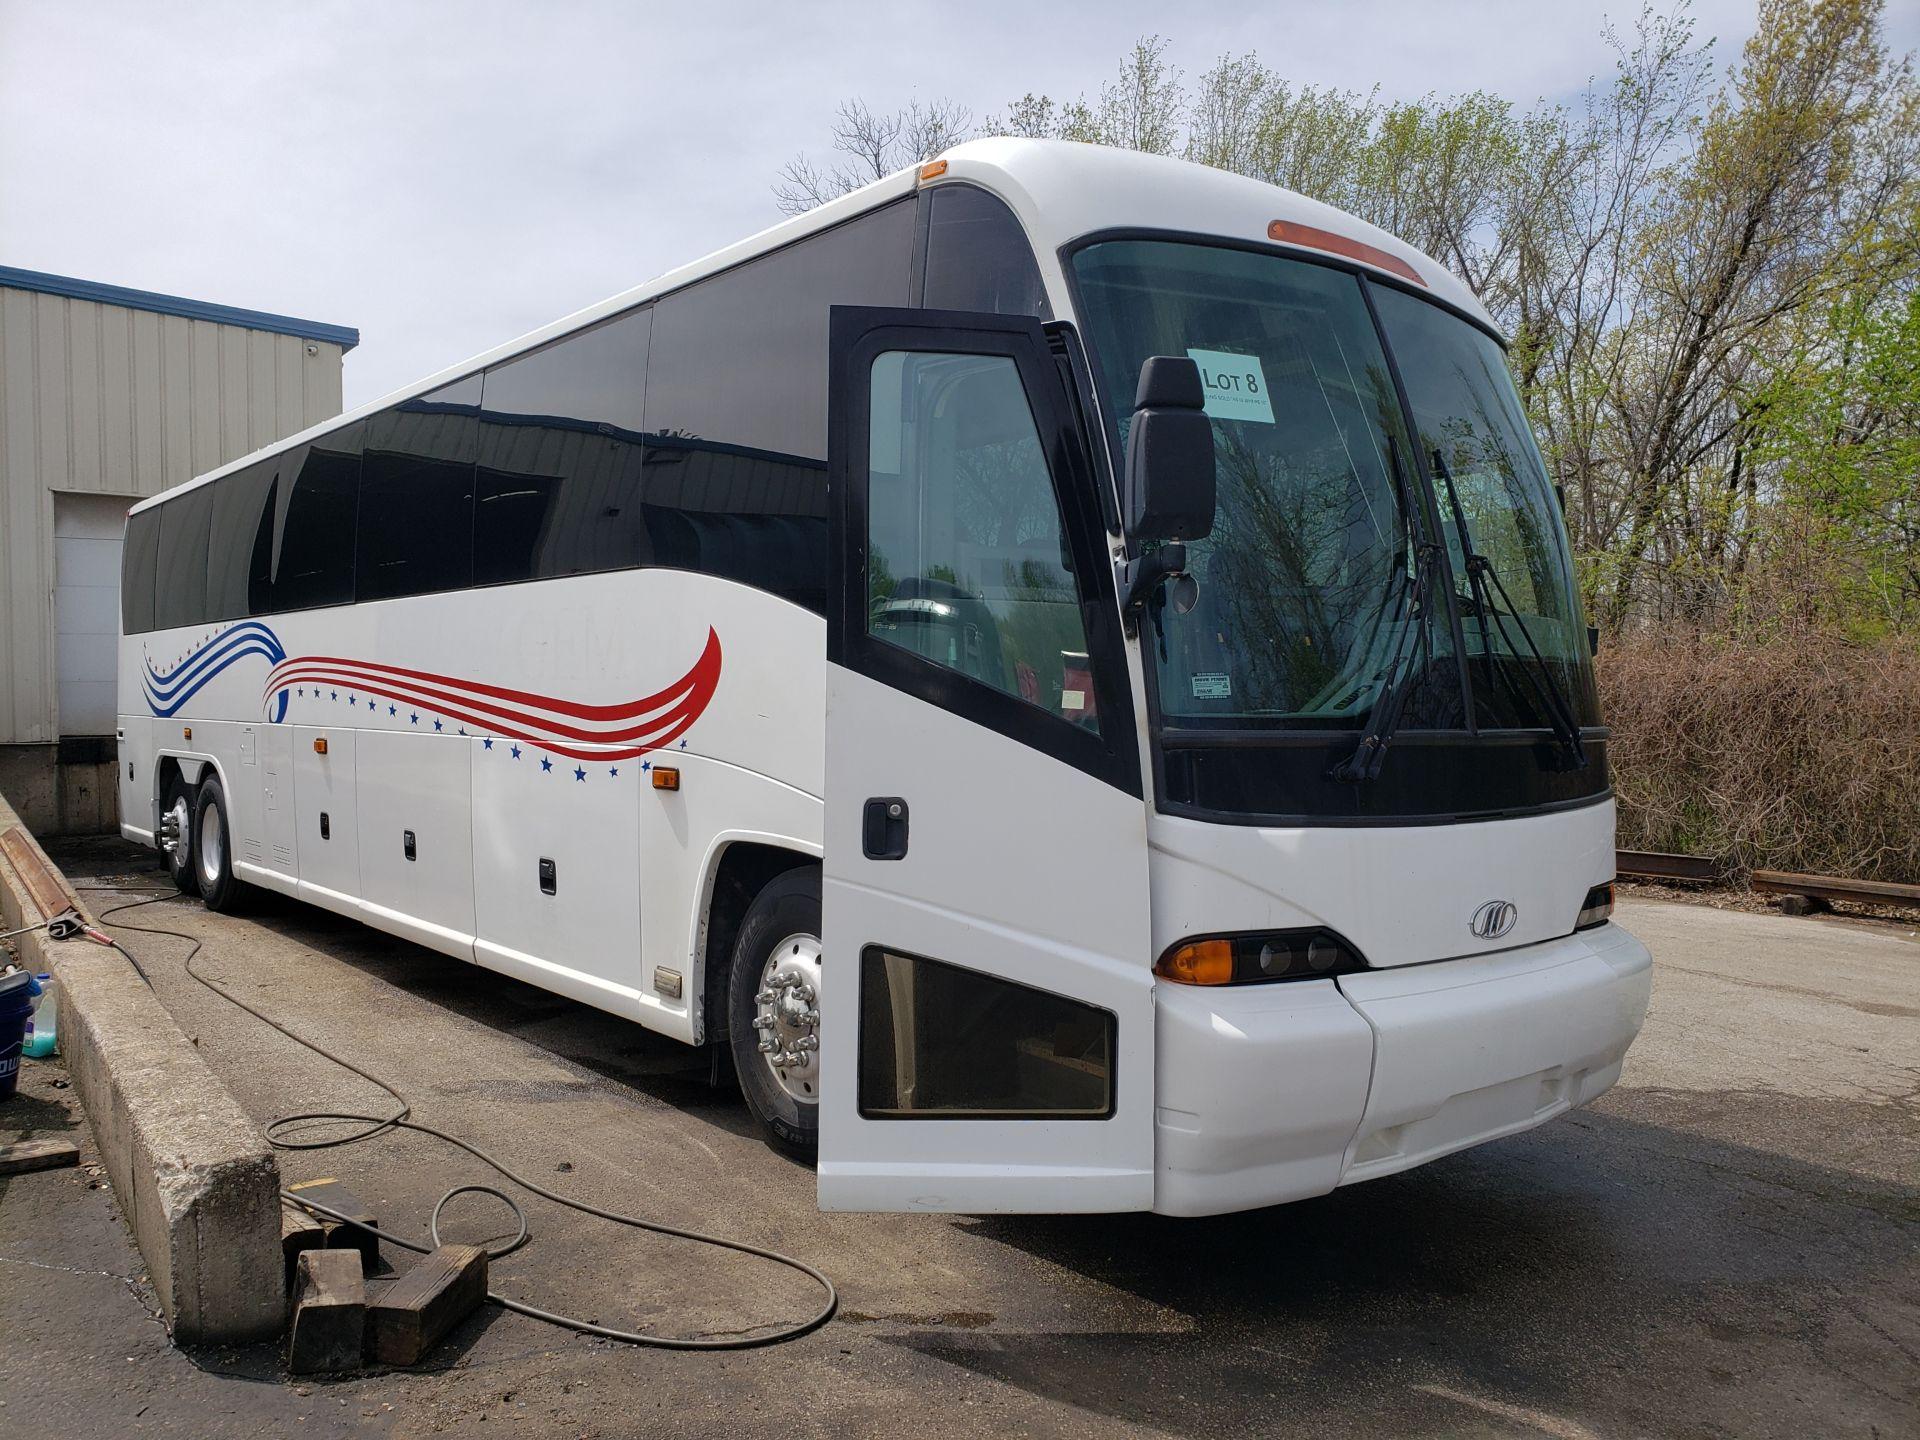 2005 MCI J4500 56-Pass Kneeling Coach Bus - Image 2 of 20